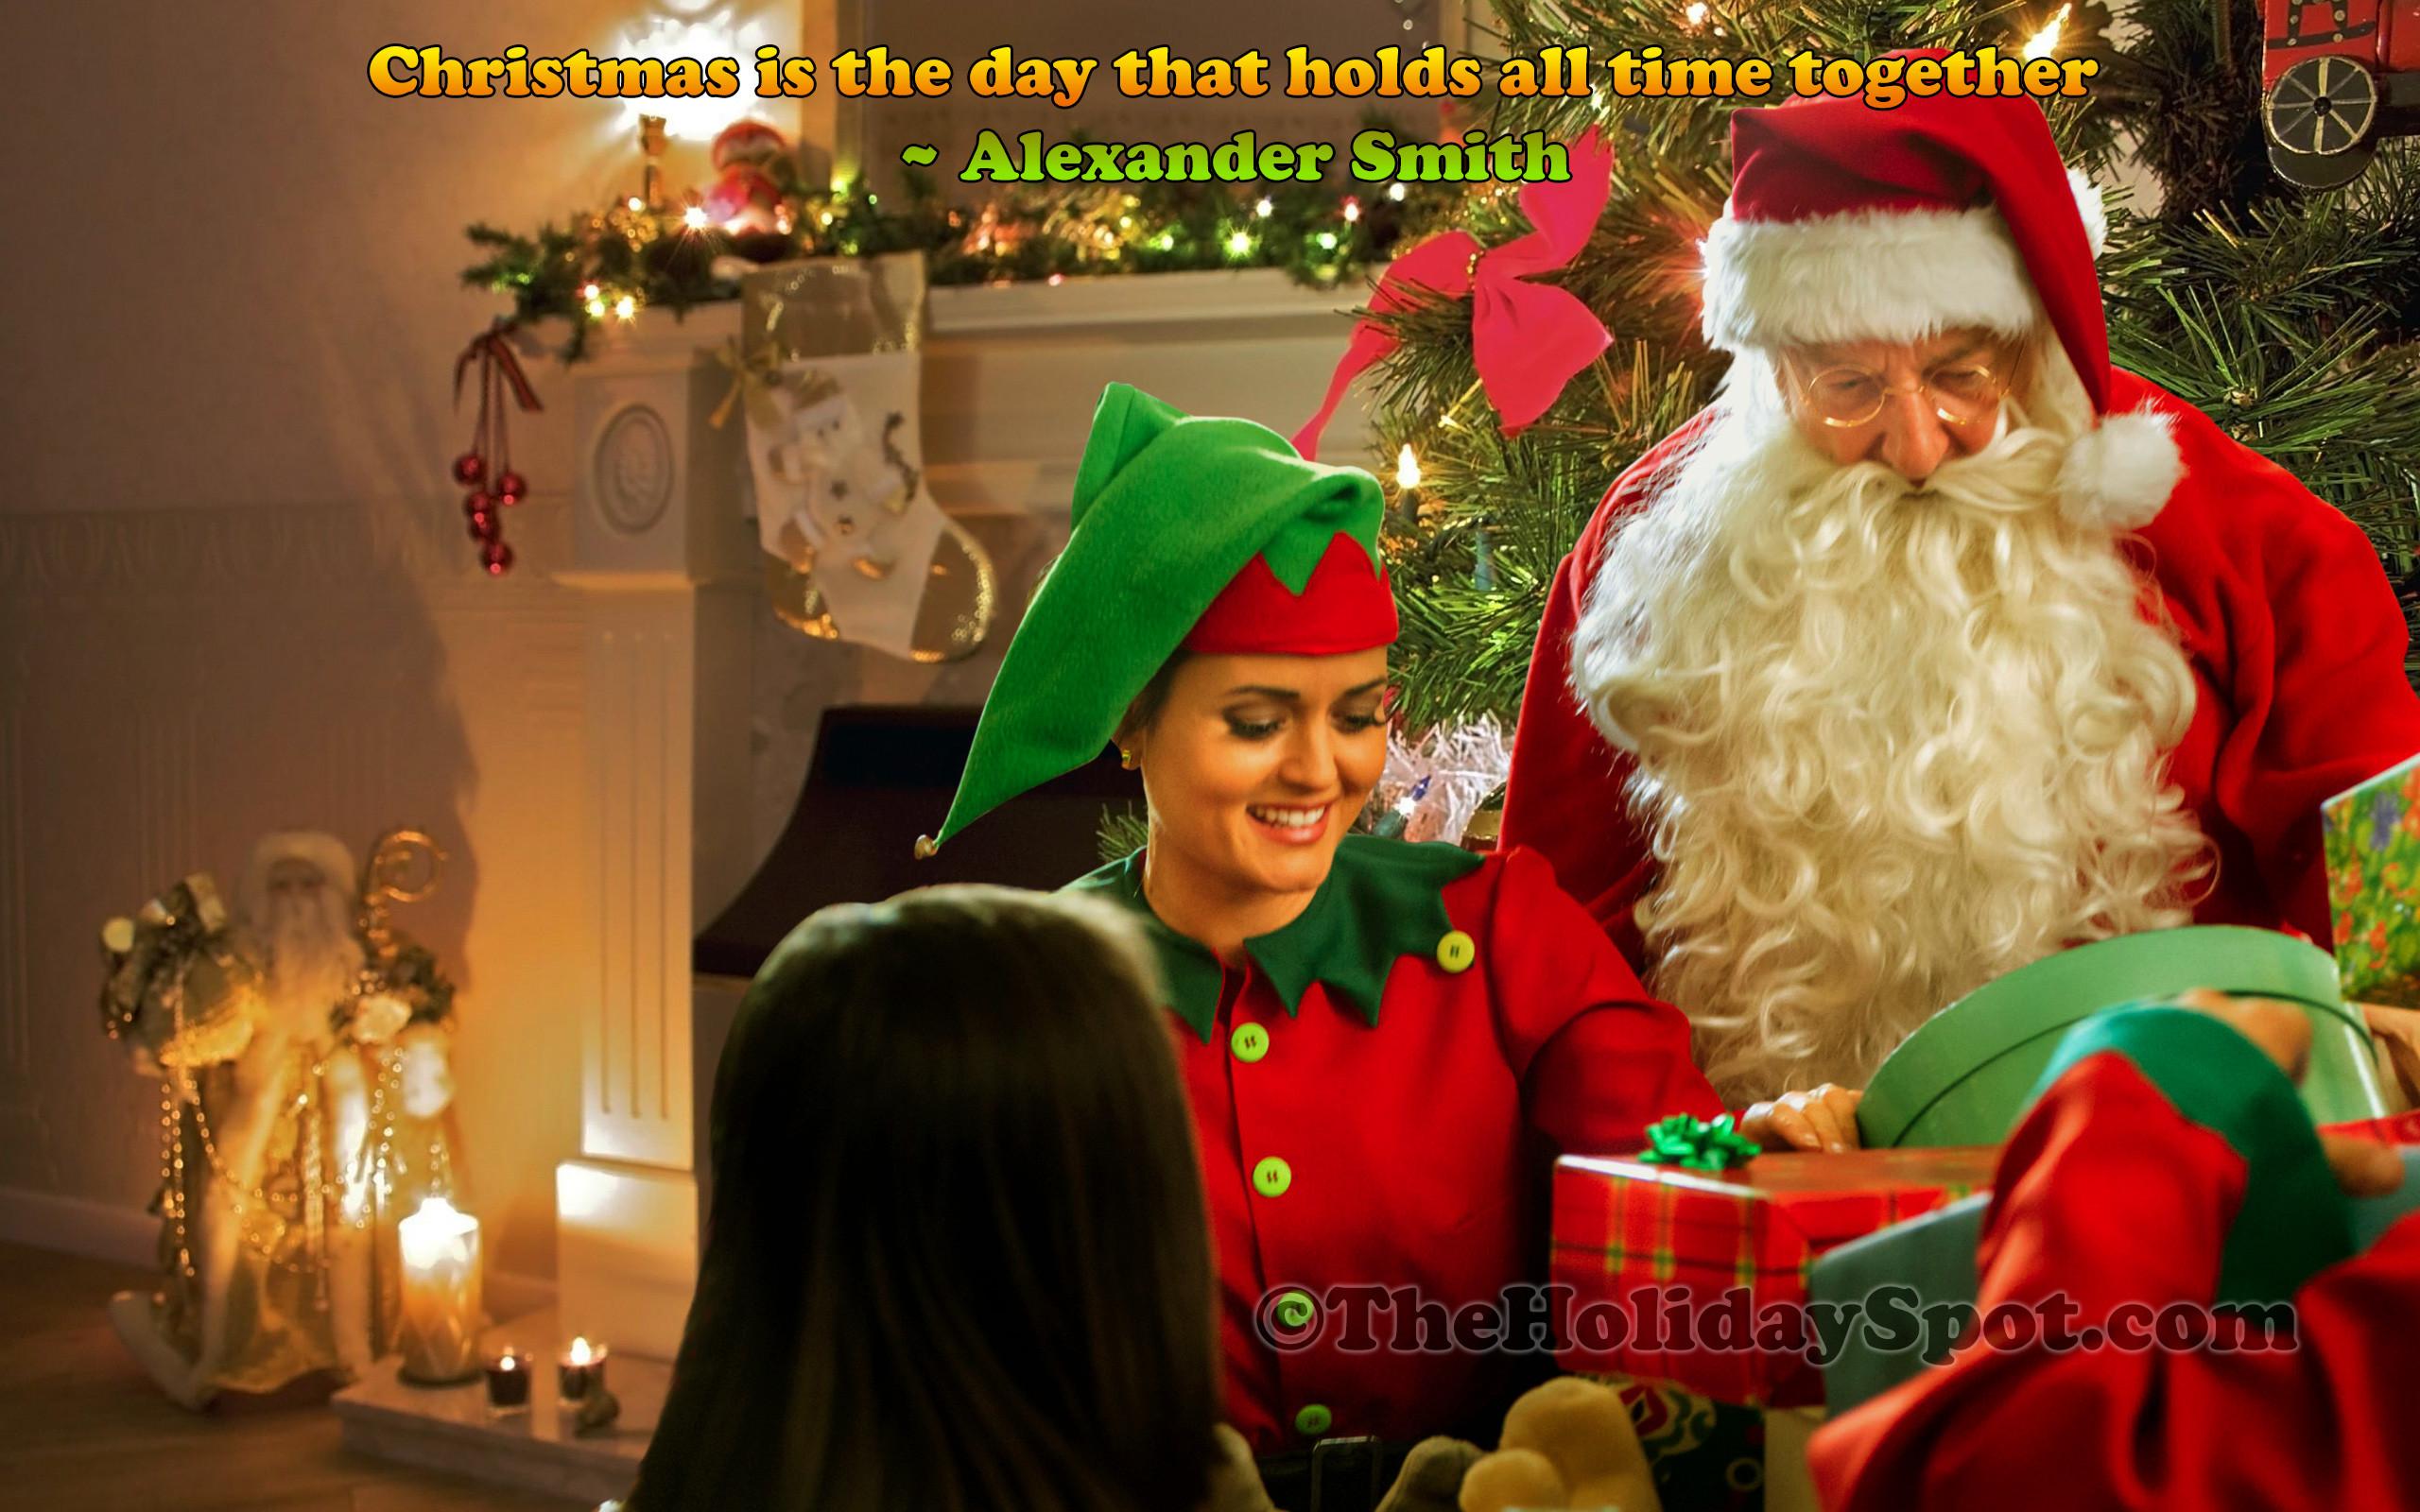 Wallpaper – Christmas celebration with Santa